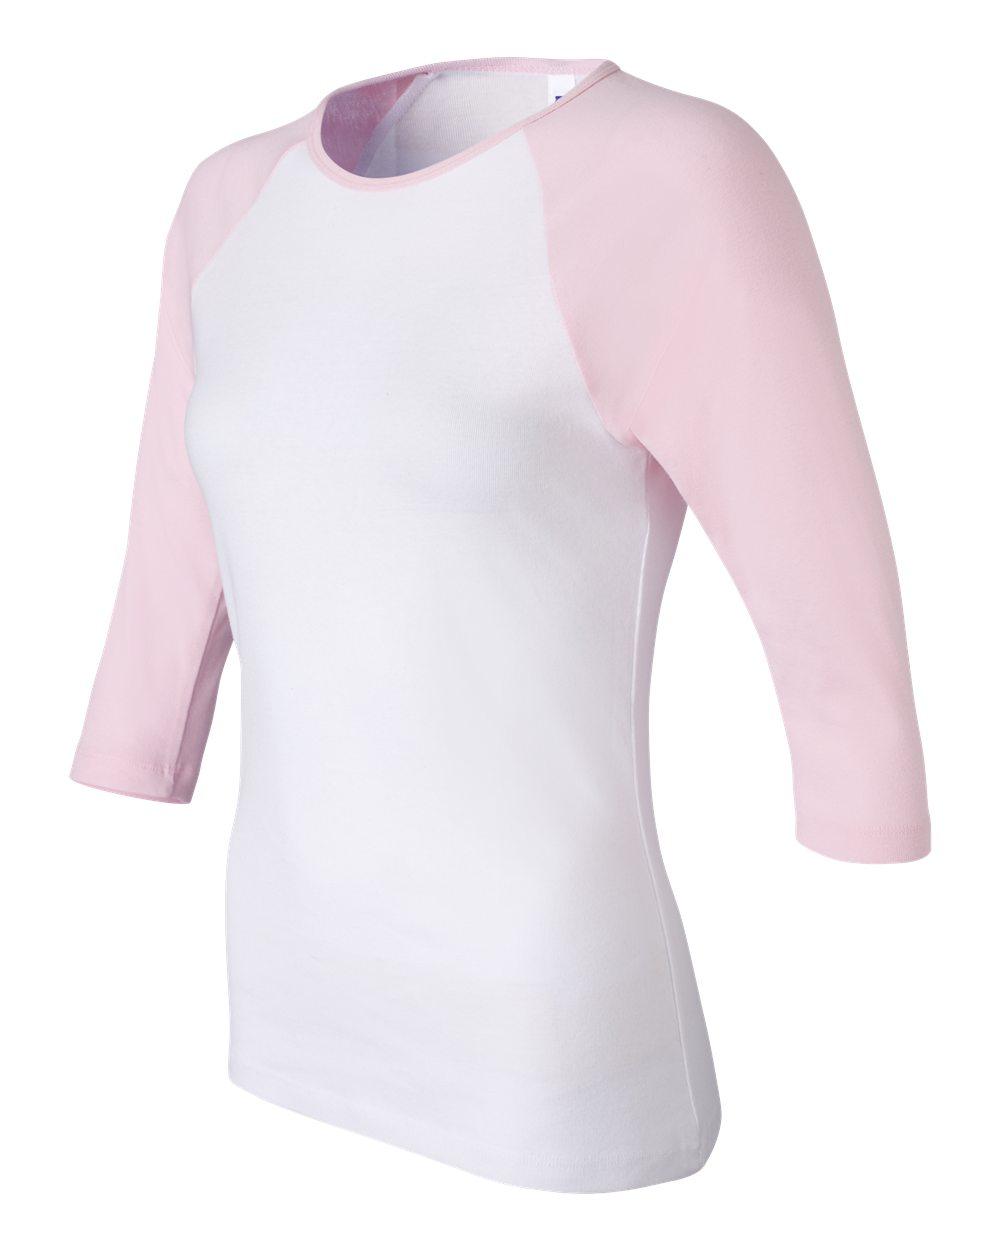 Bella 2000 White - Pink